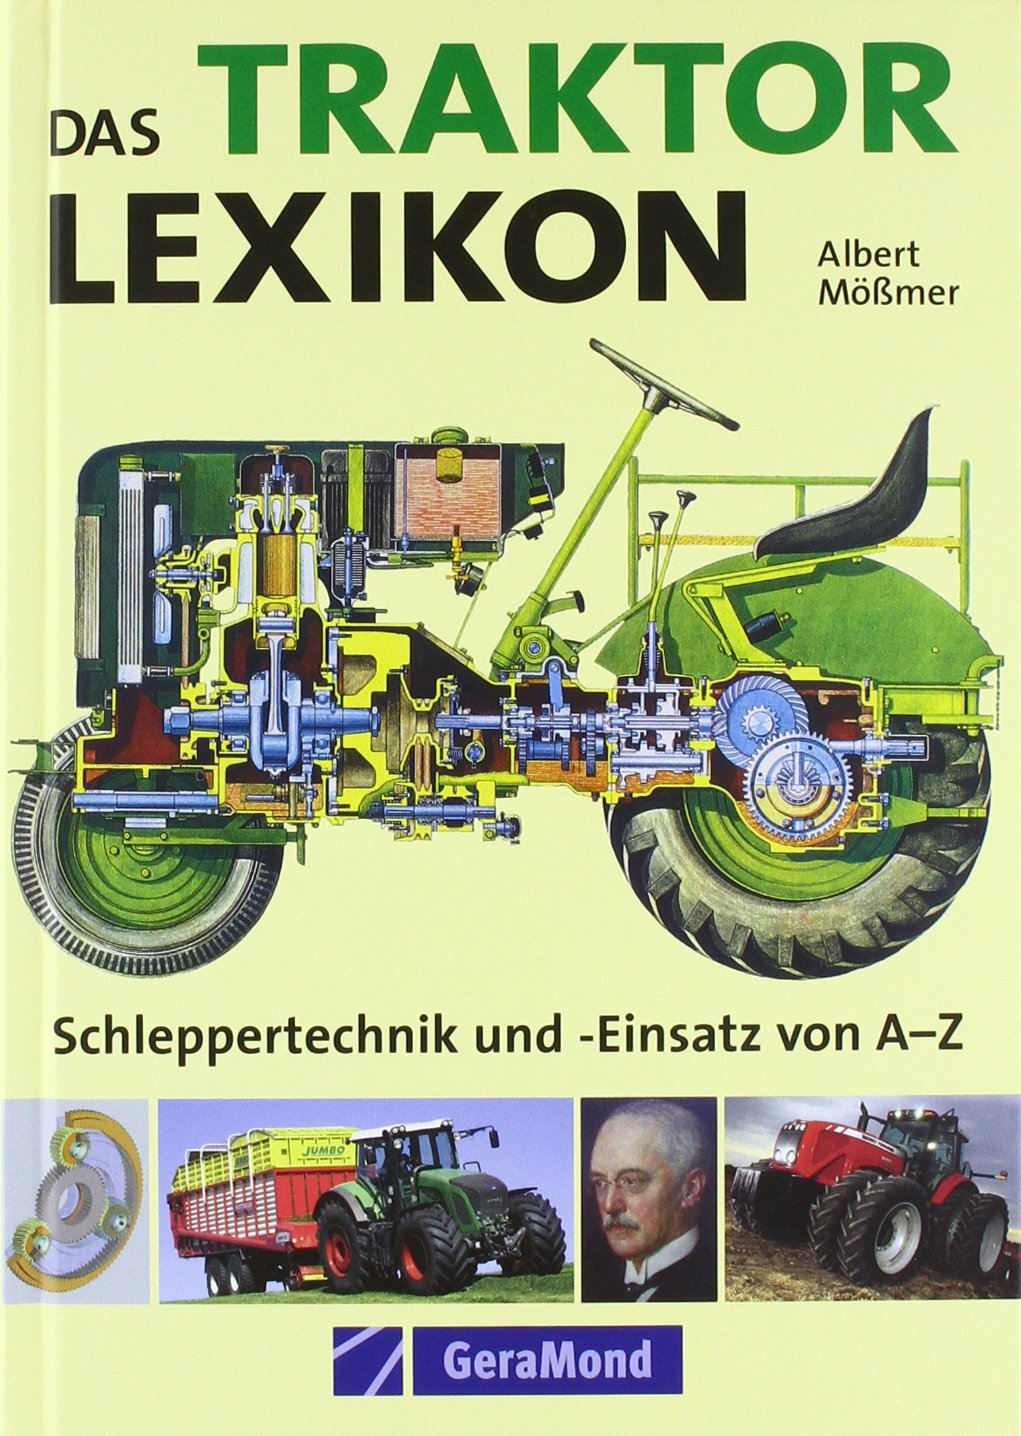 Das Traktor Lexikon (GeraMond)